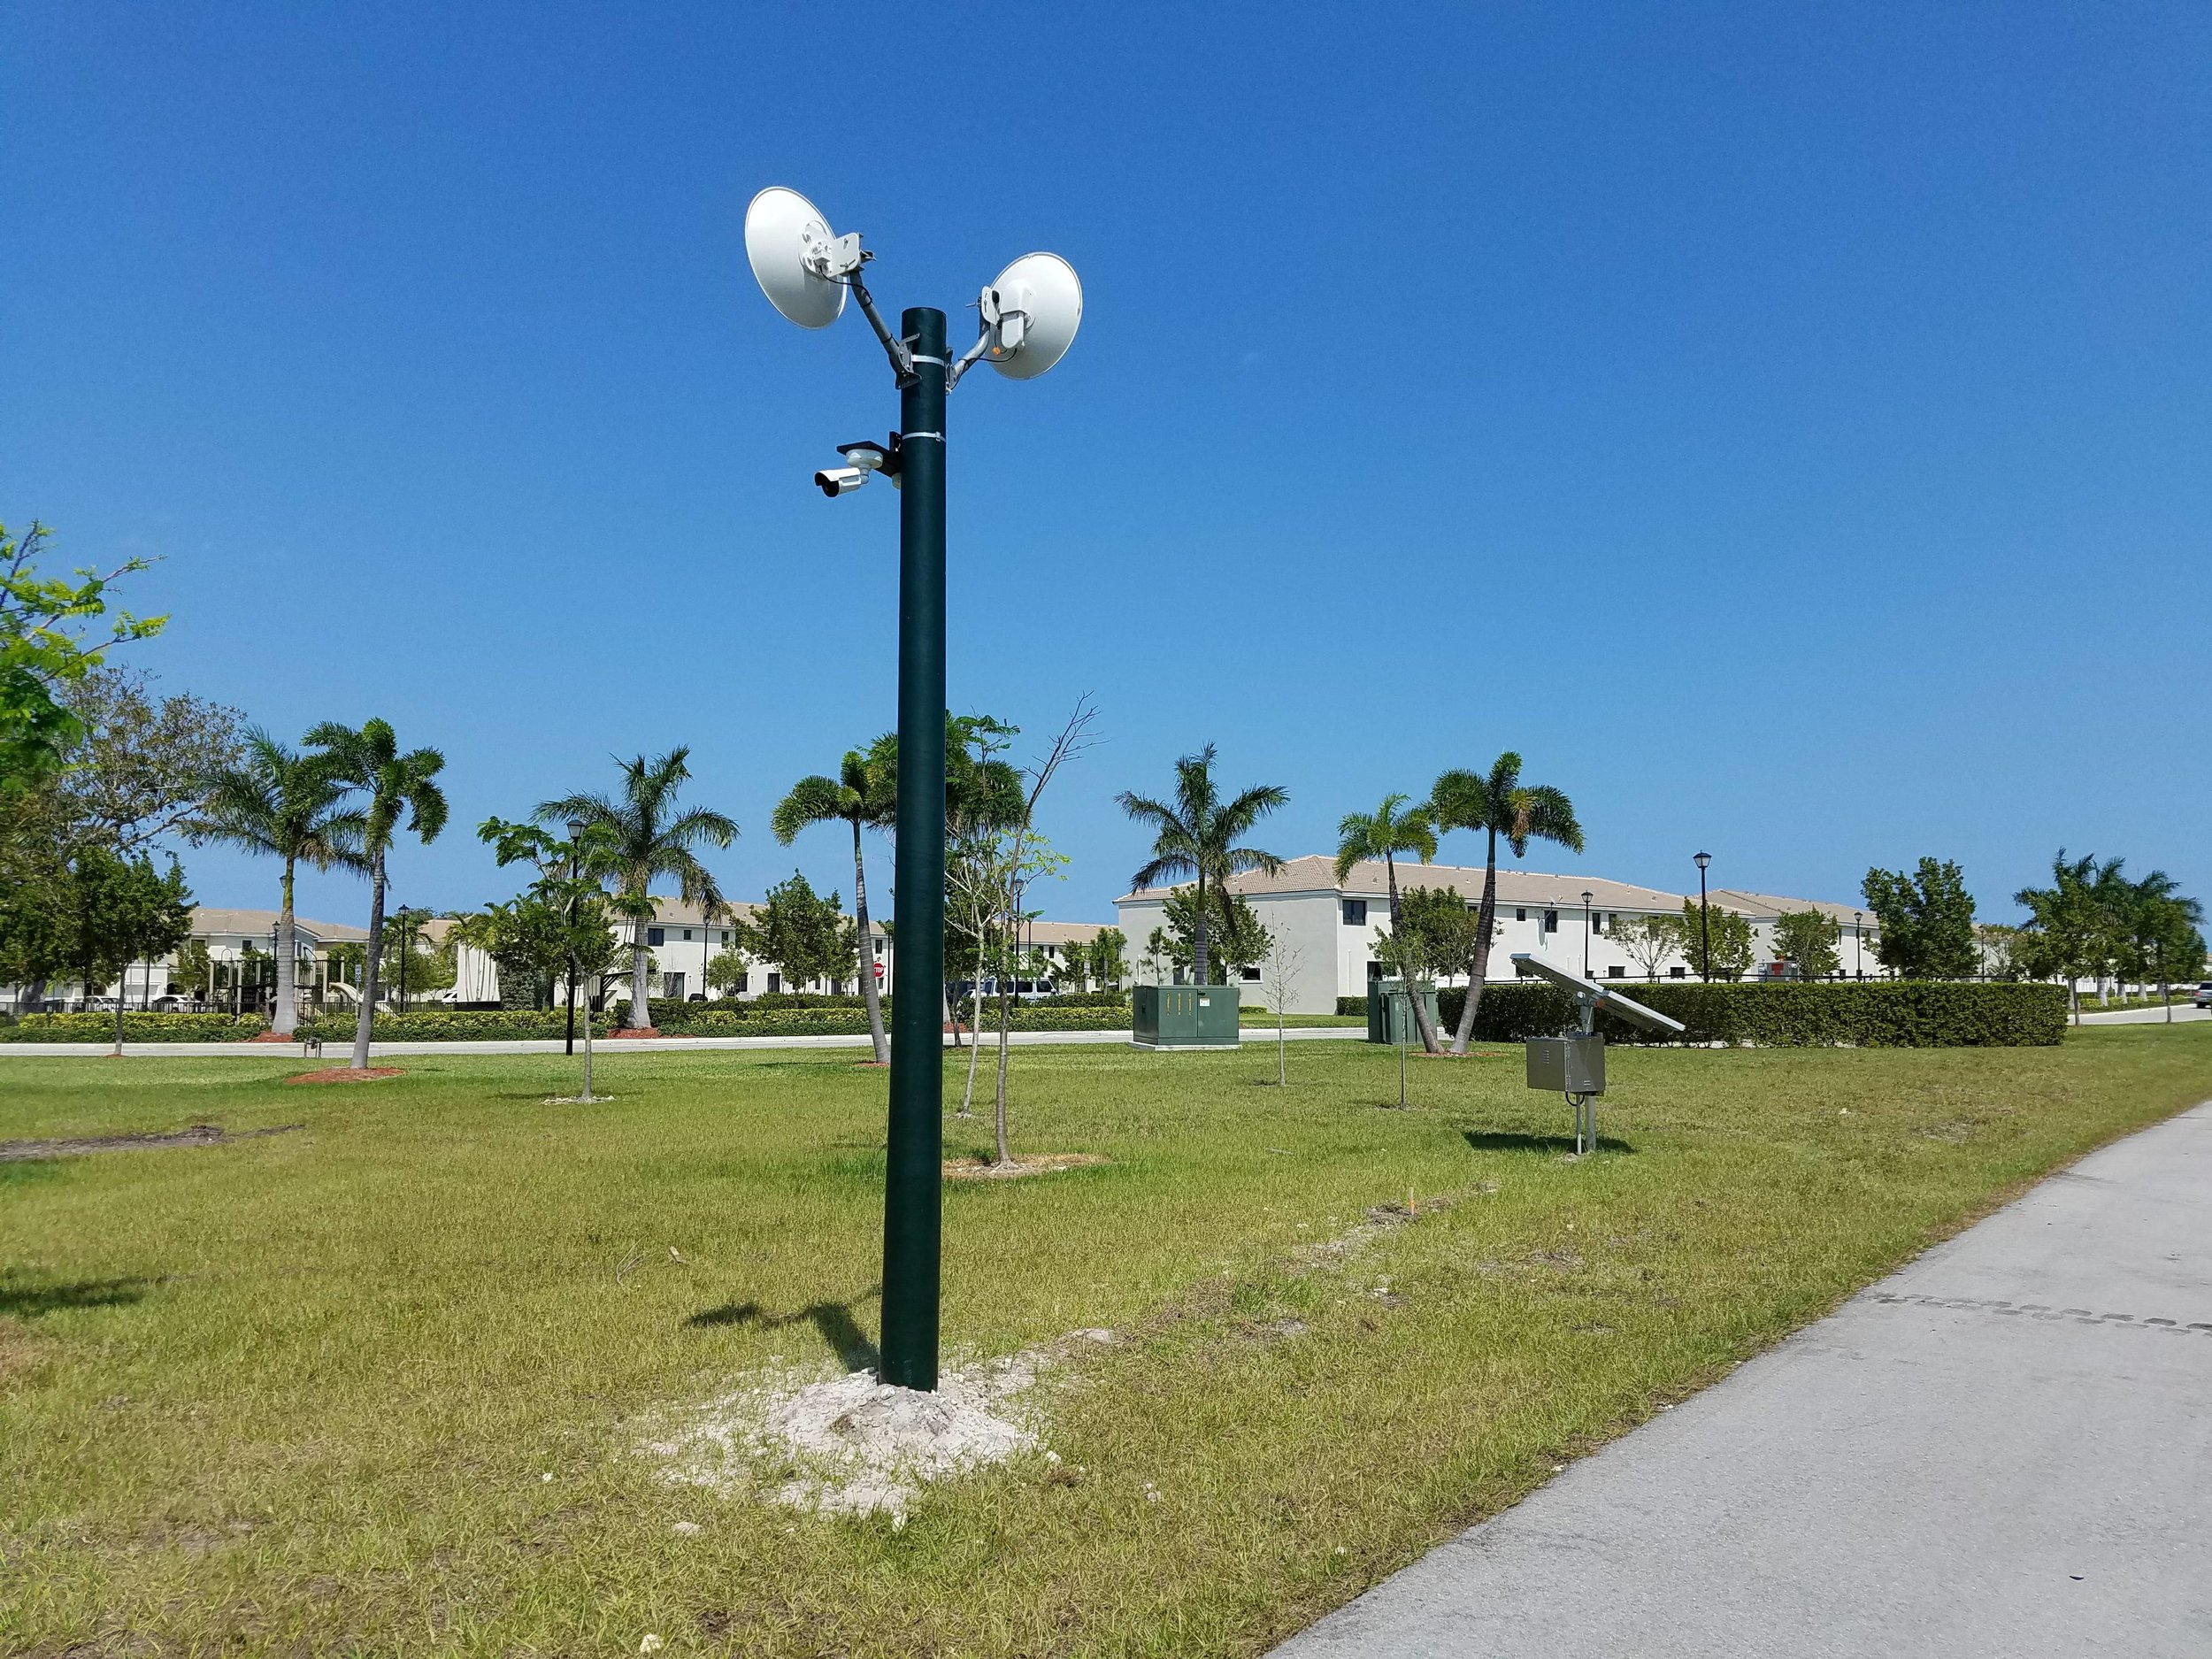 fiberglass-pole-security-camera-install-1.jpg